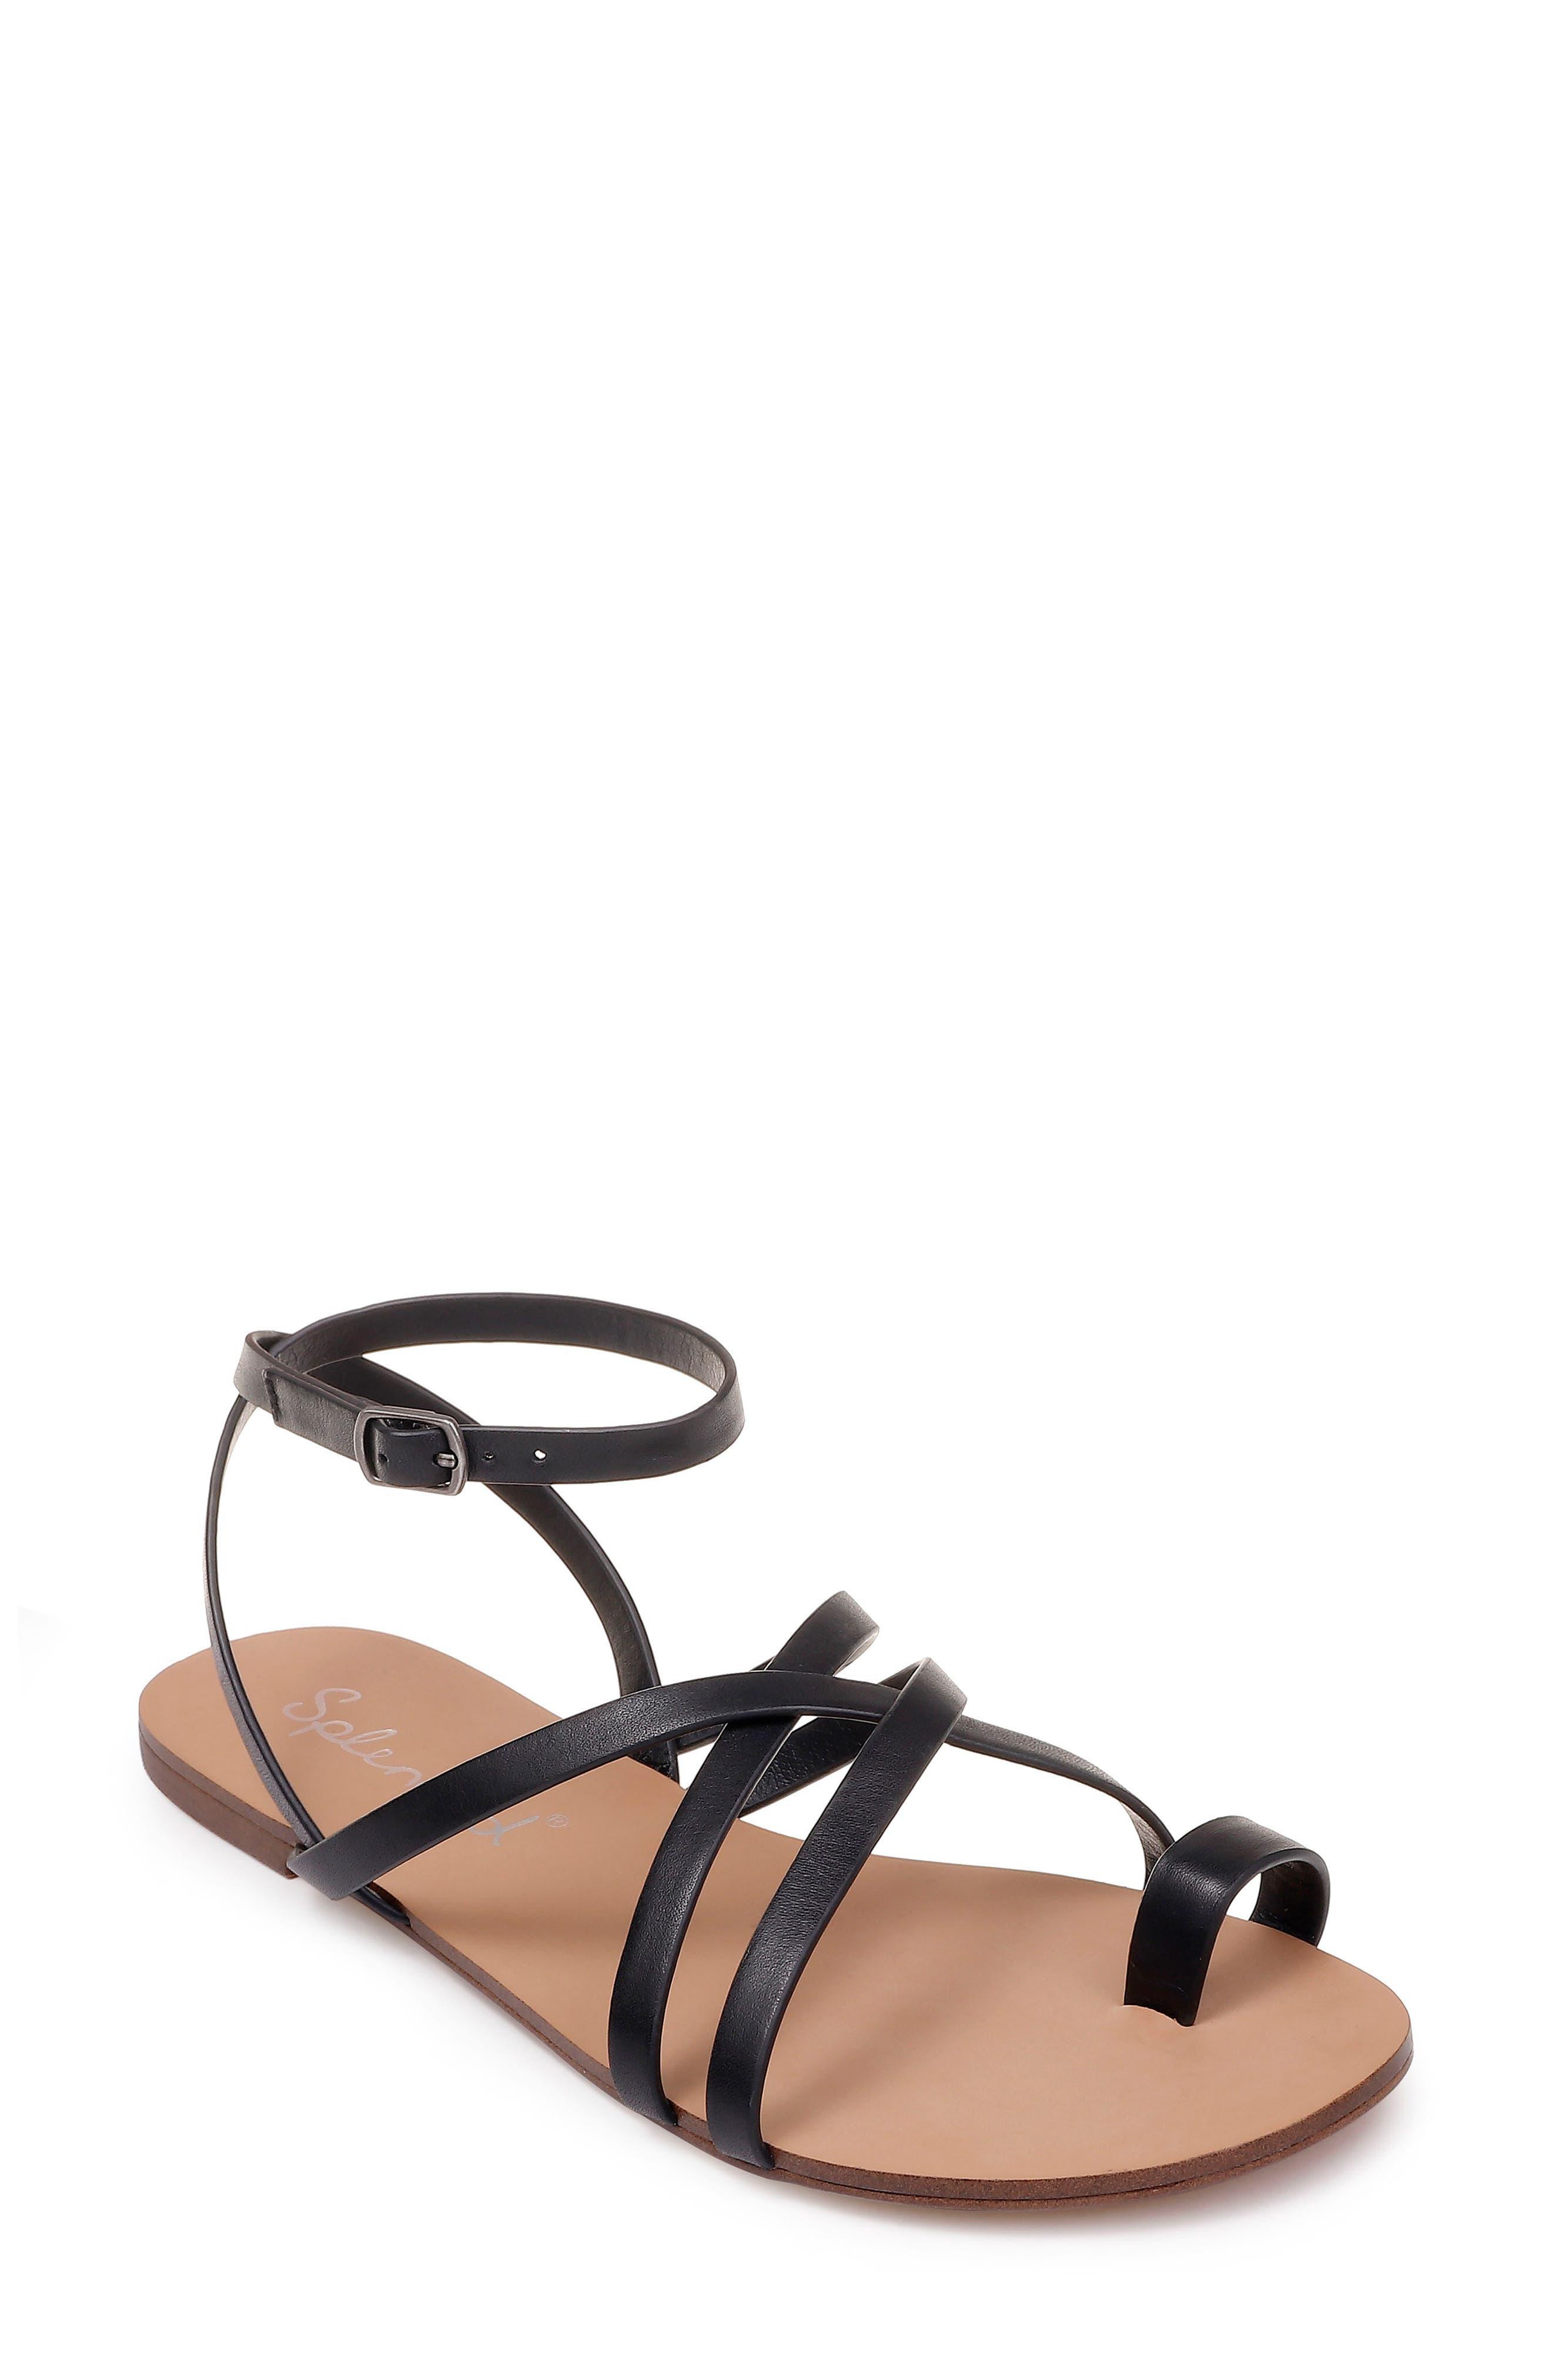 Splendid Sully Strappy Toe Loop Sandal